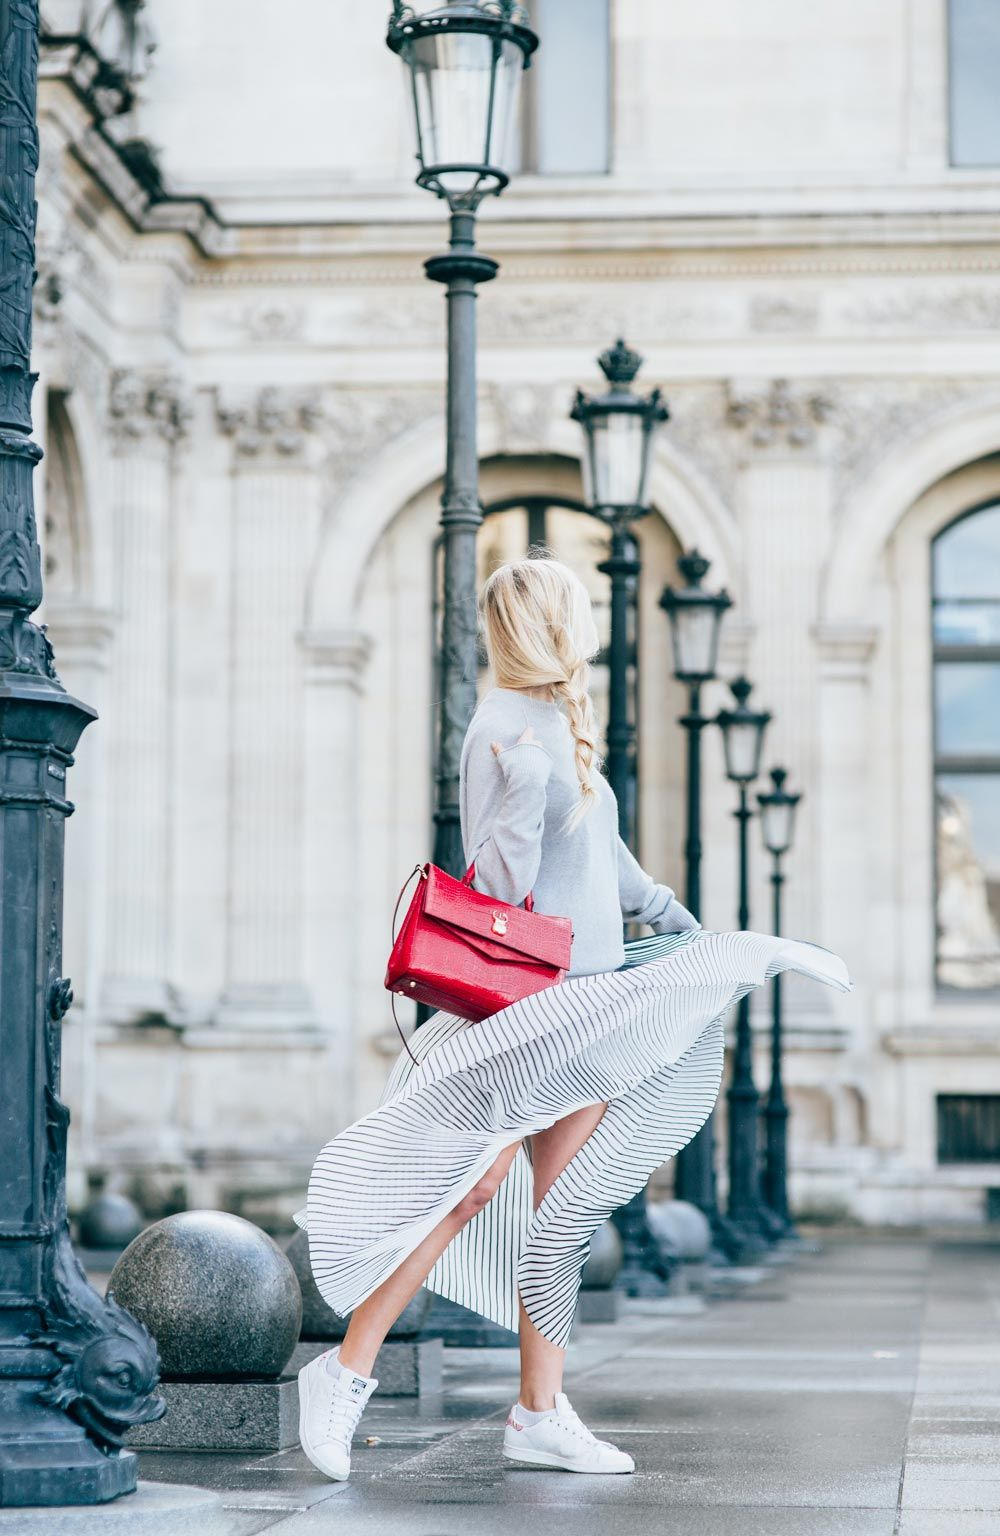 Fashion - Kira Kosonen All grey outfit